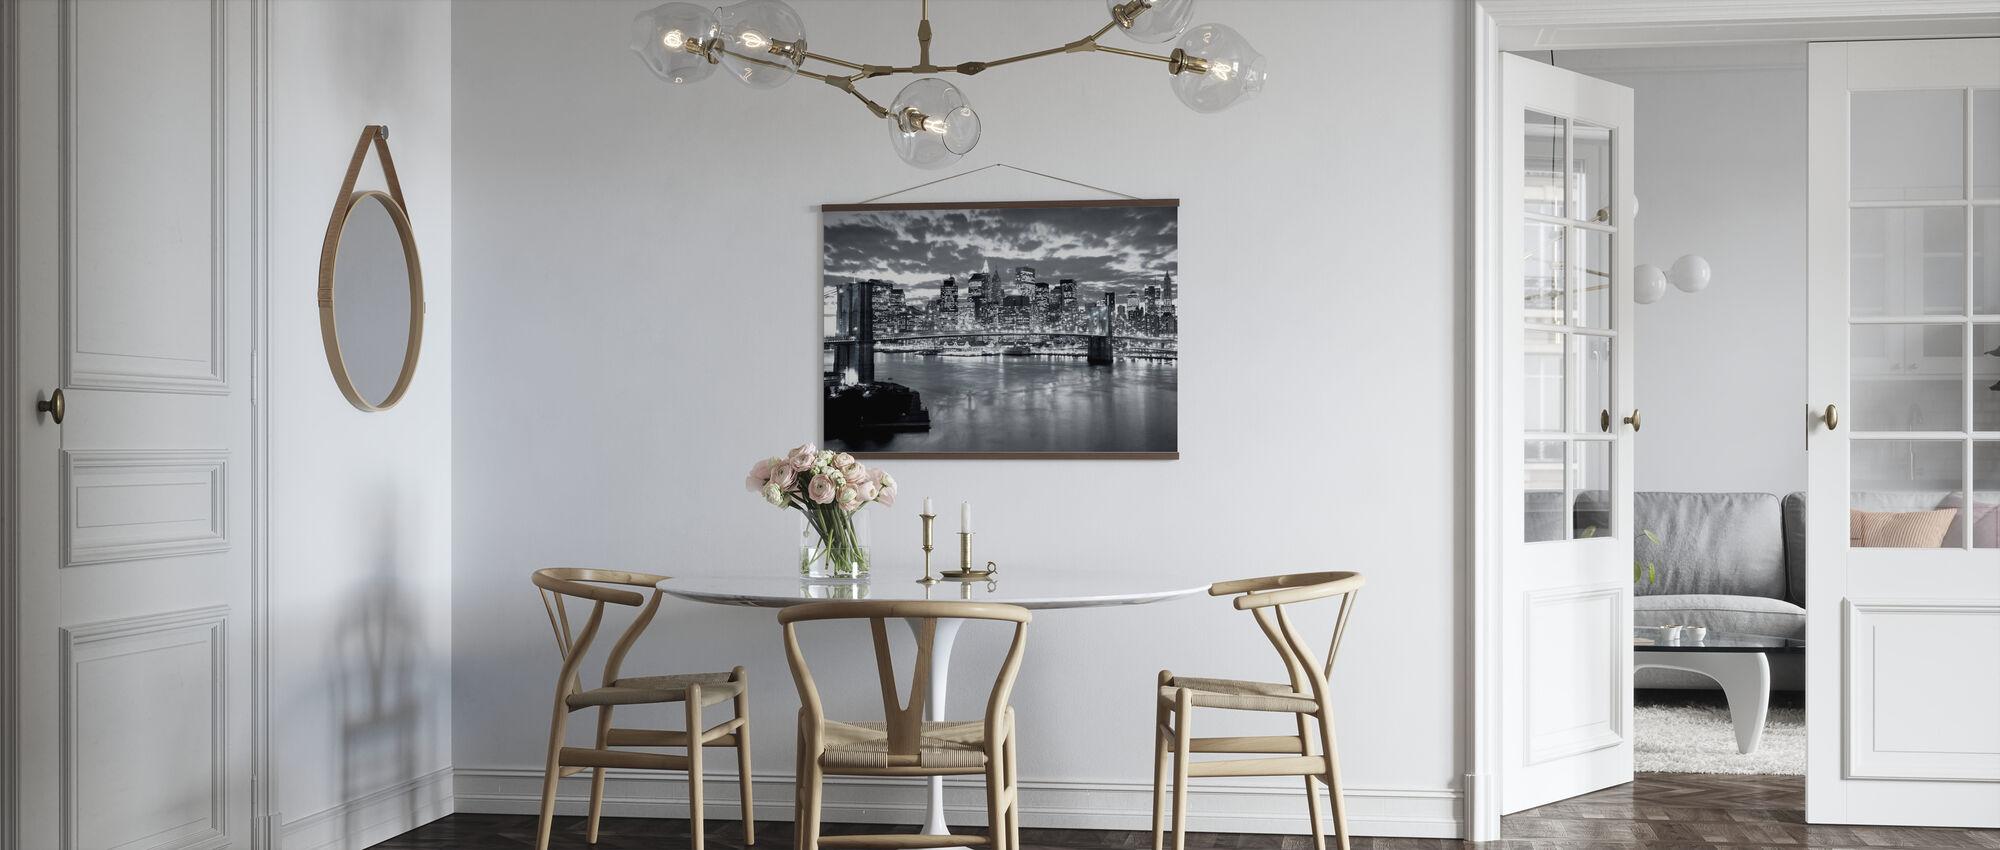 Brooklyn Bridge Cloudy Day - Poster - Kitchen